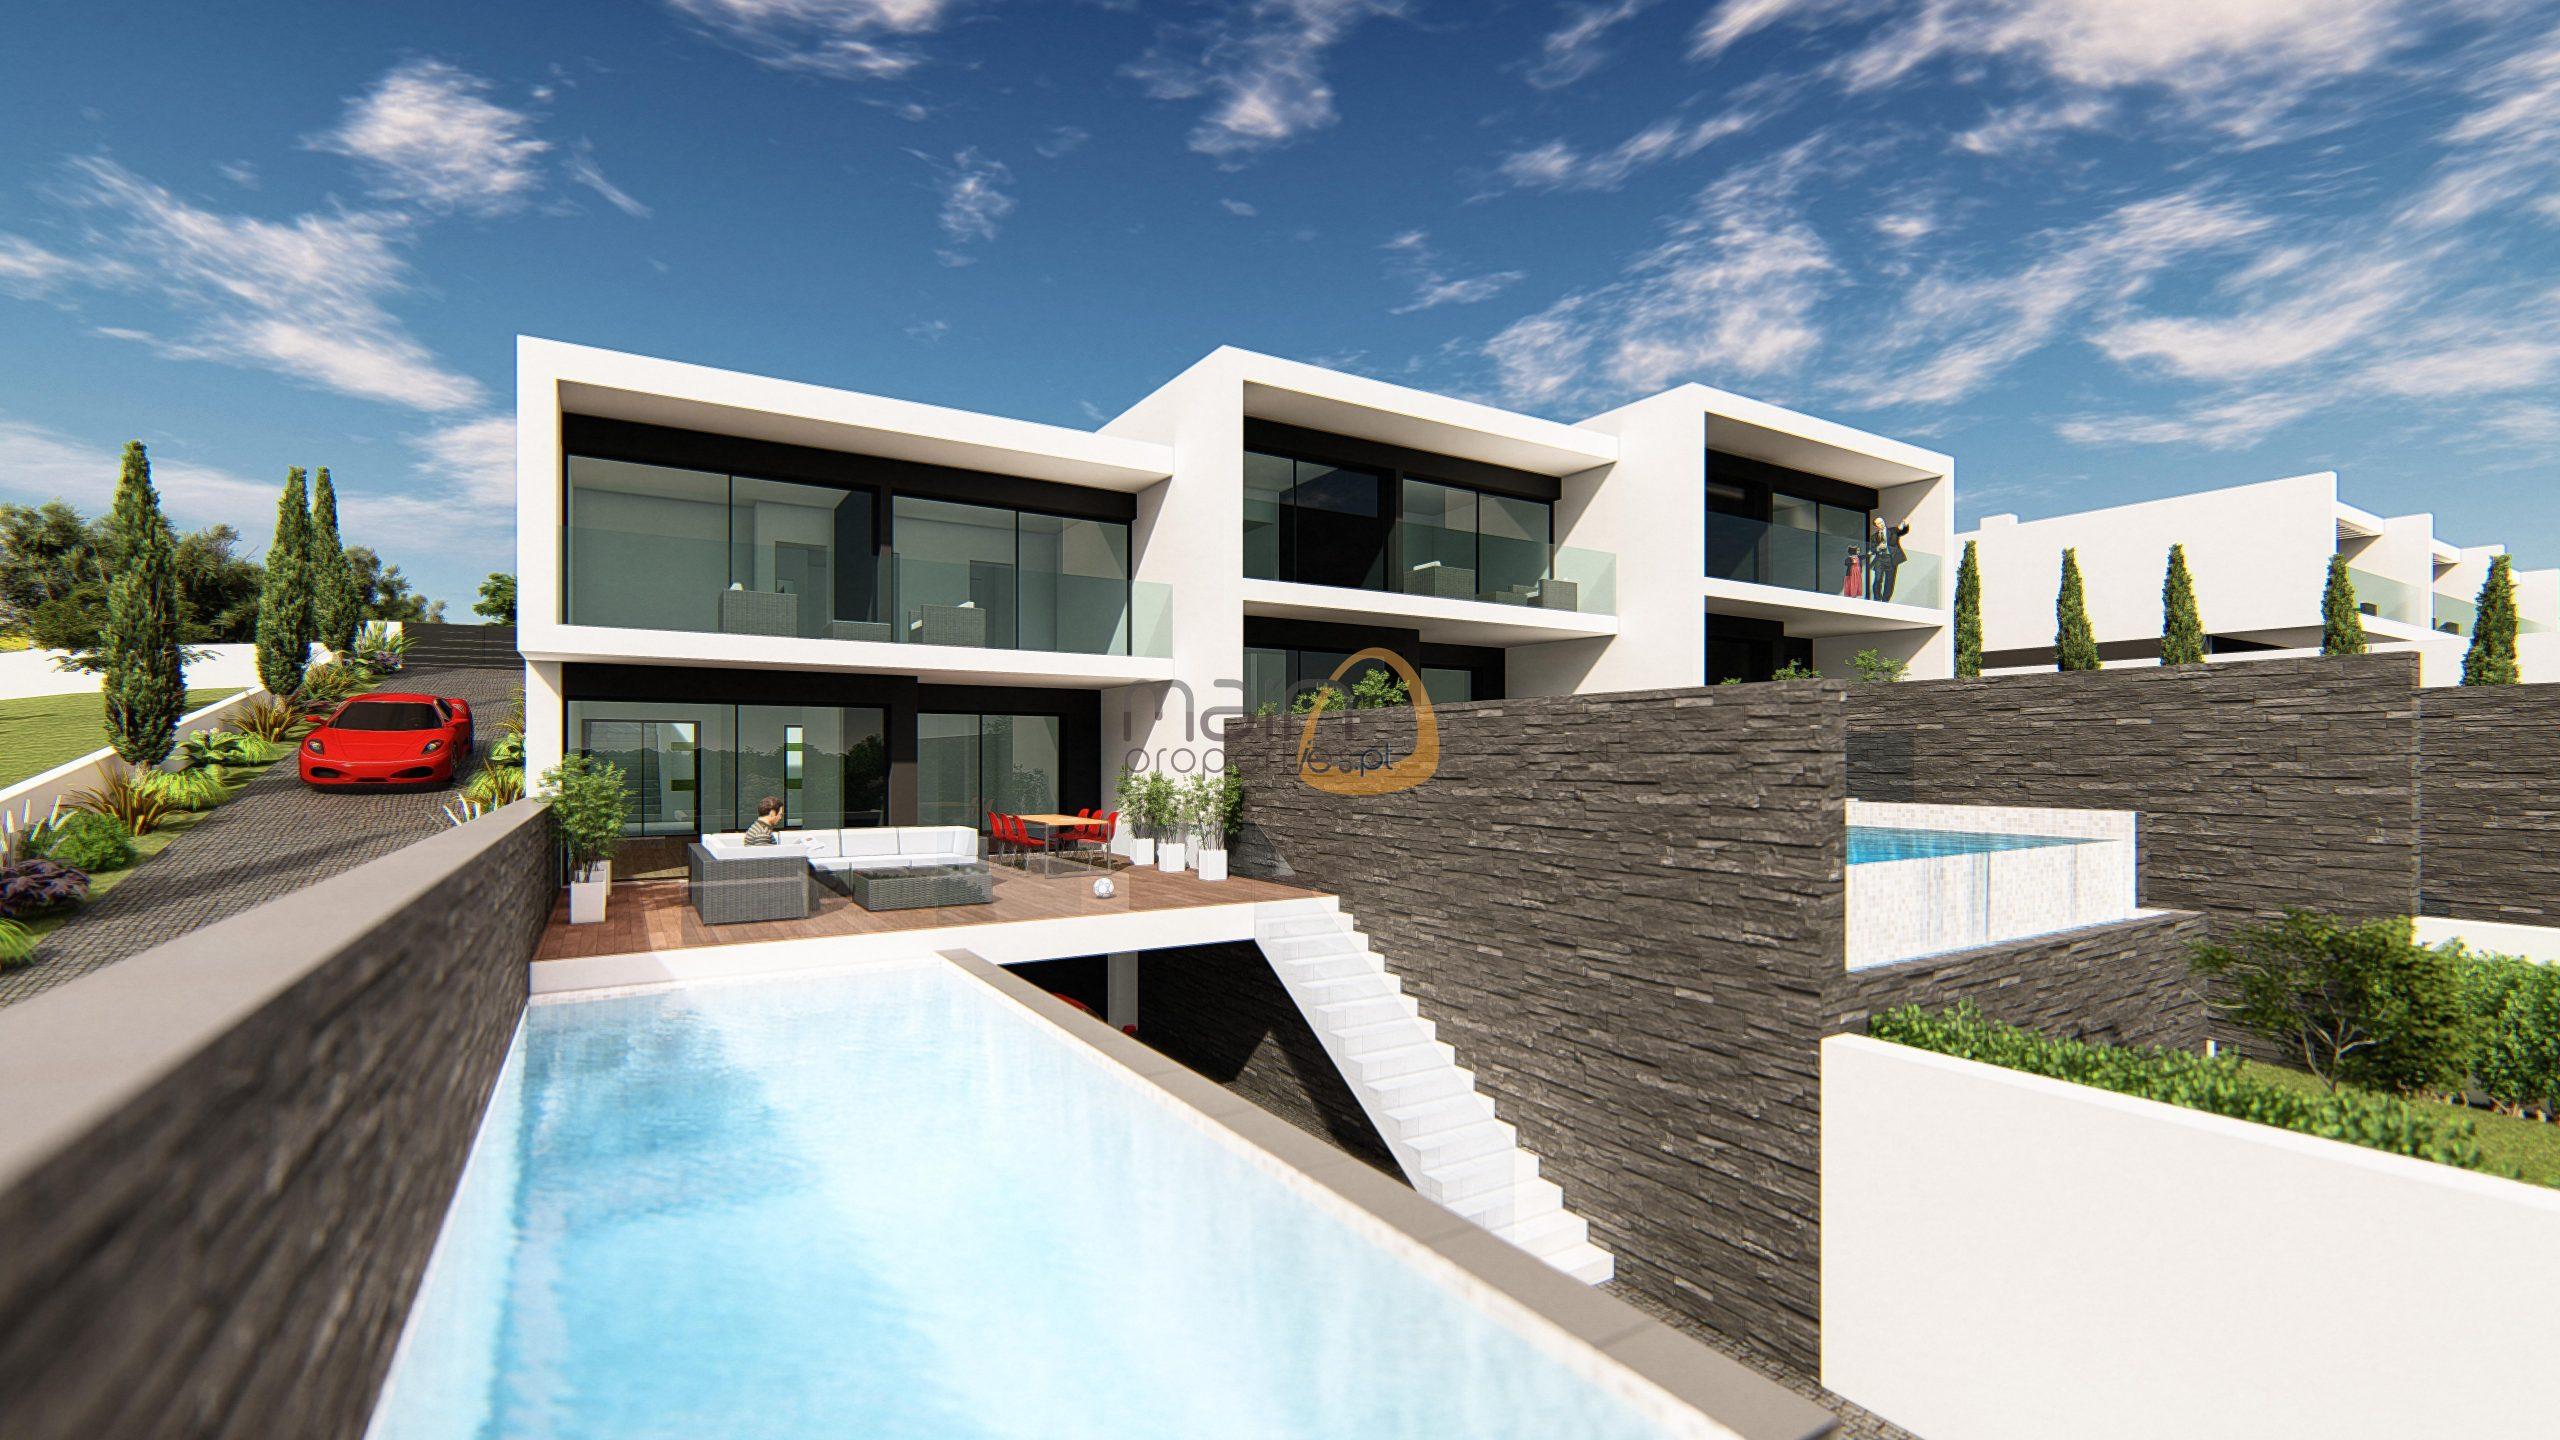 land-for-development-of-eleven-villas-with-sea-views-in-almancil-algarve-portugal-property-real-estate-05